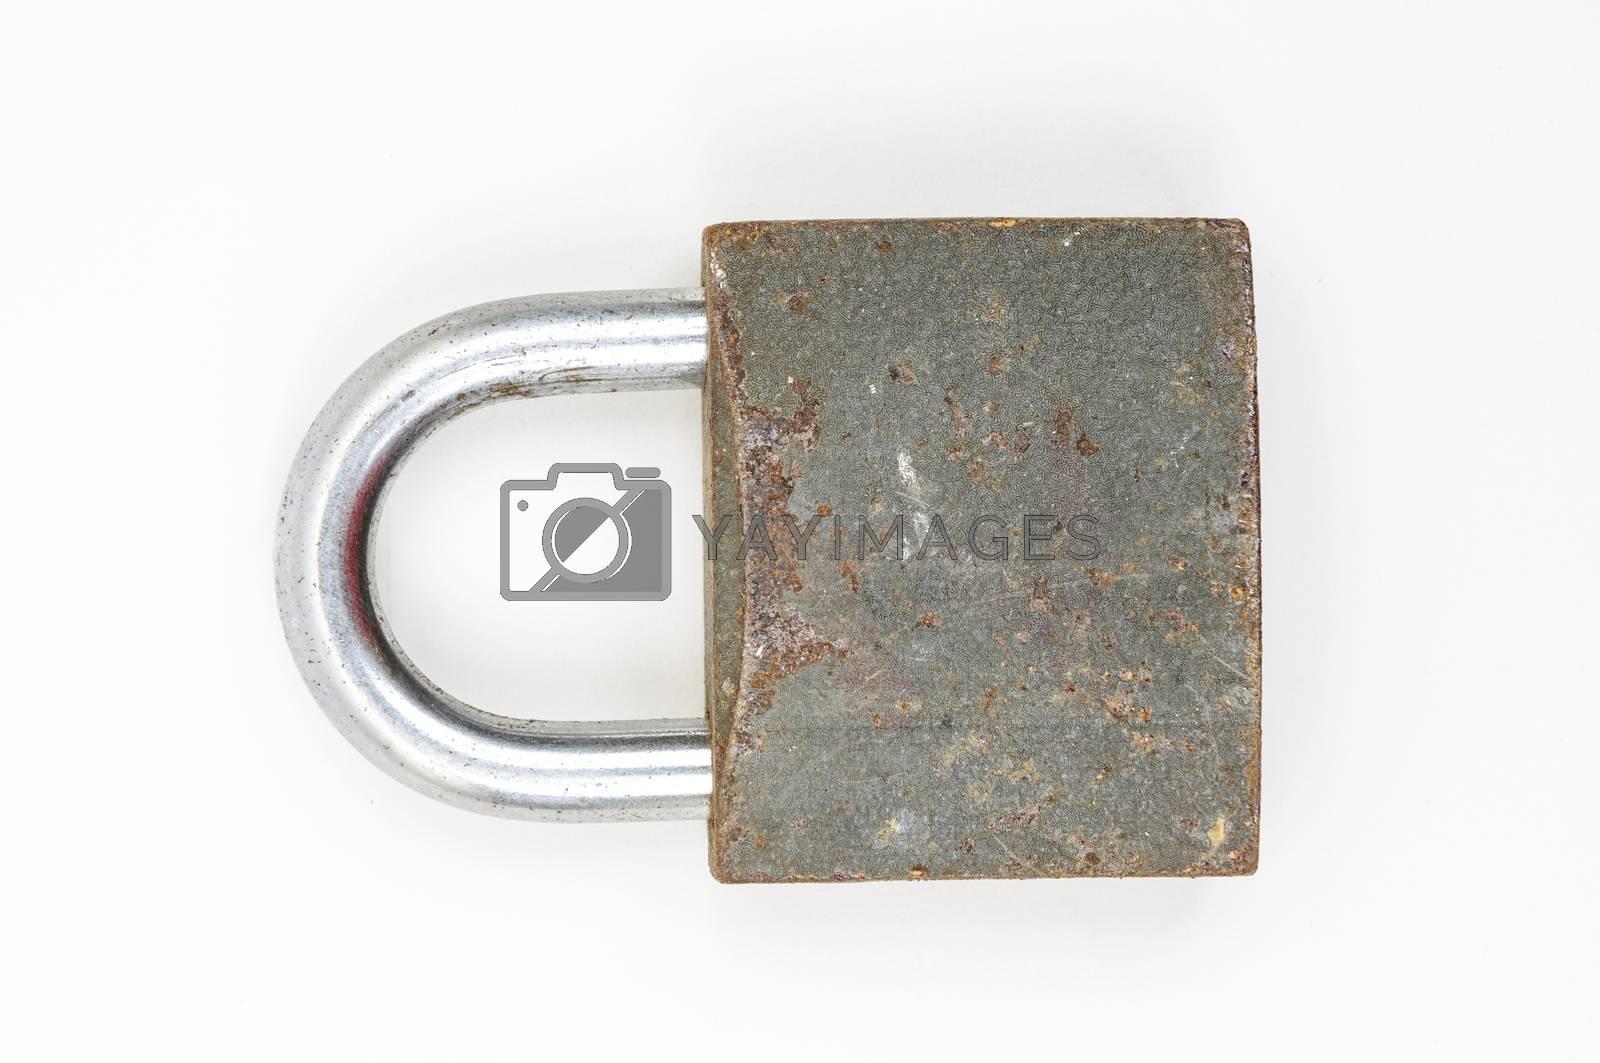 Royalty free image of rusty padlock by emirkoo